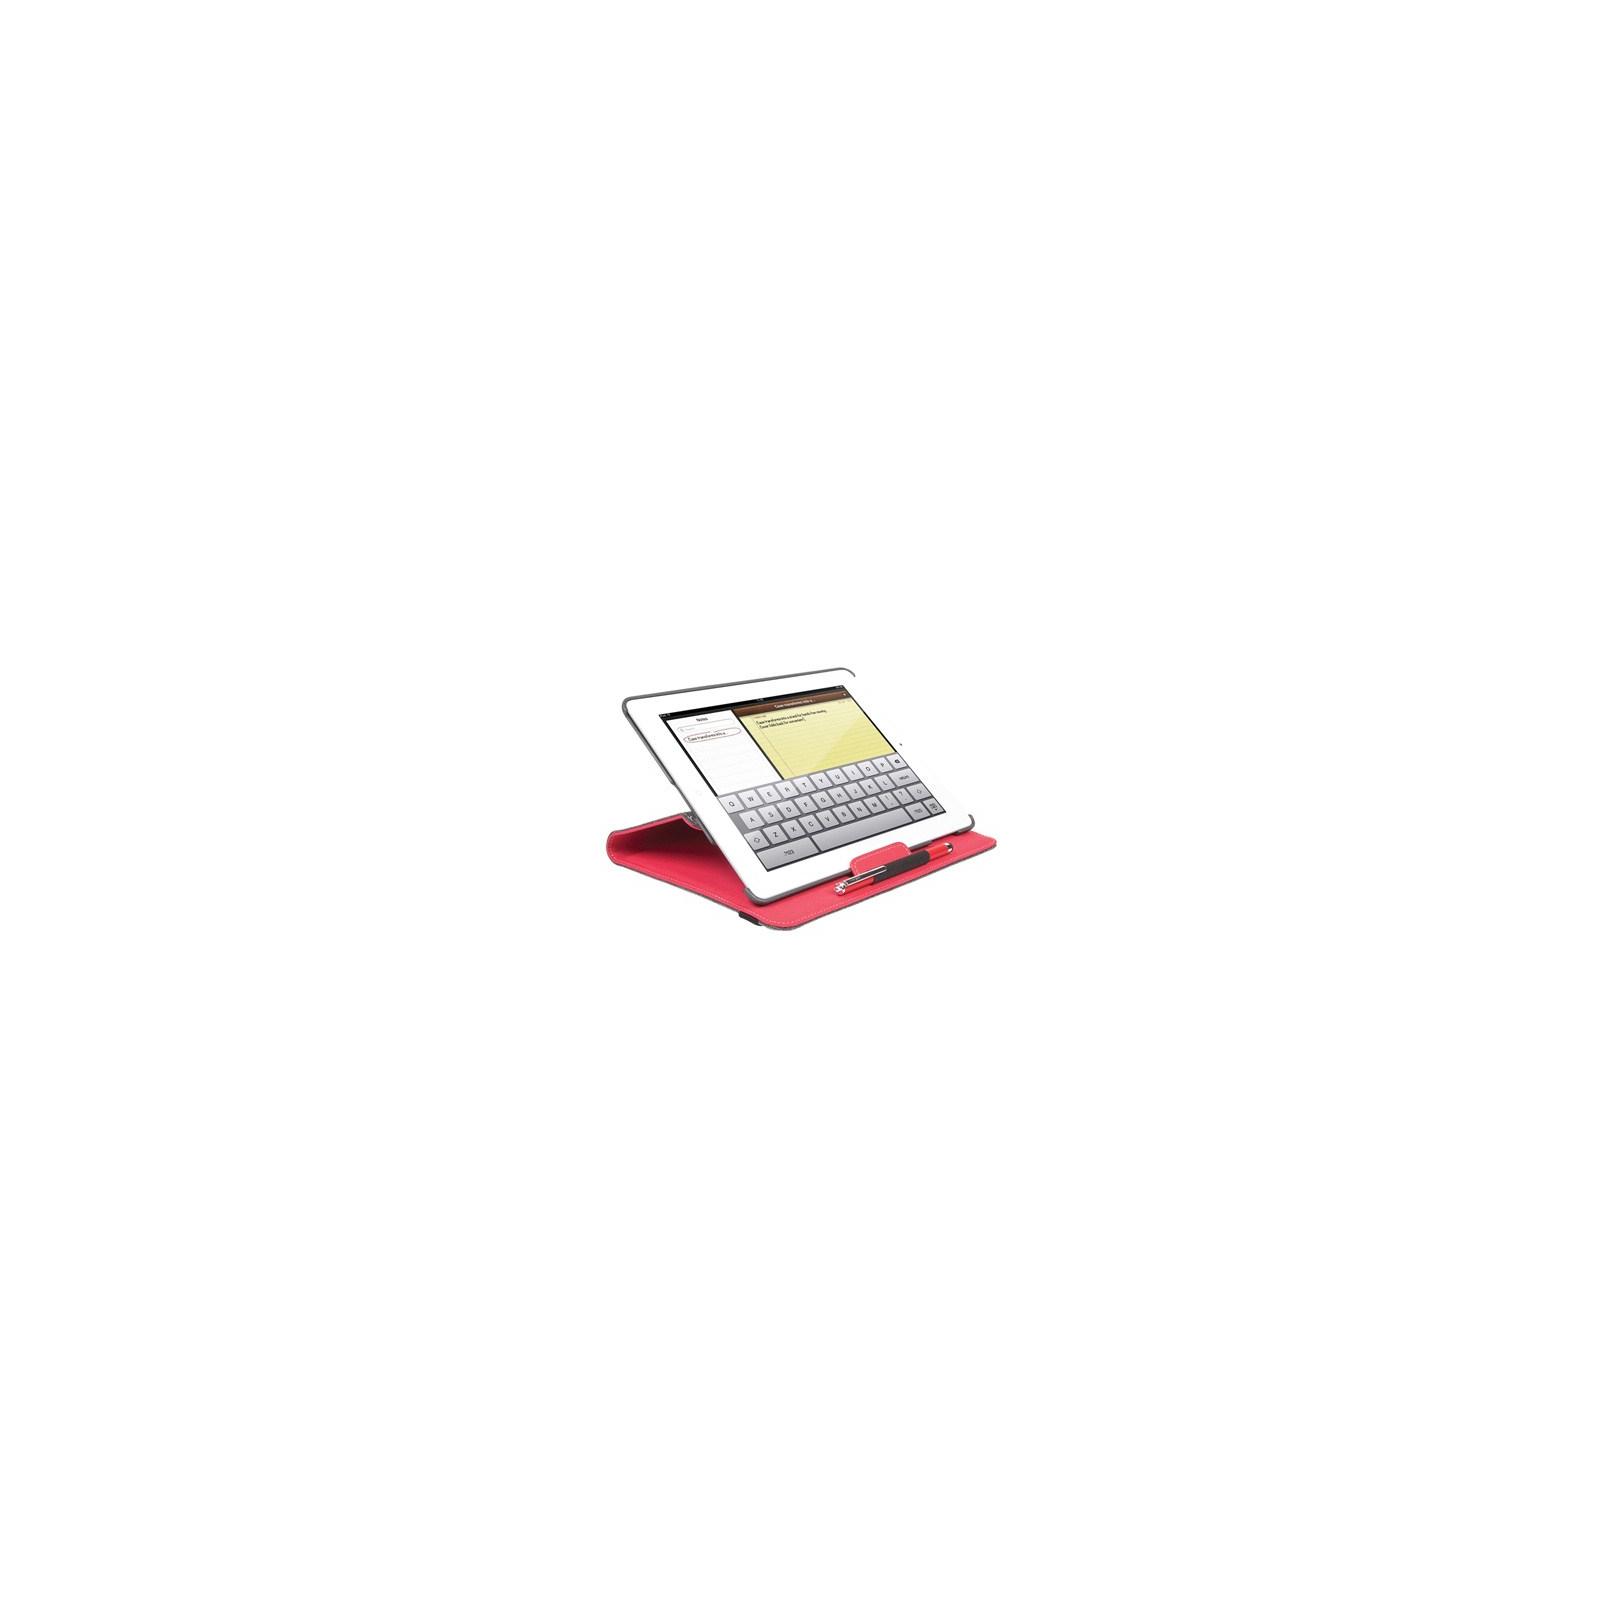 Чехол для планшета Targus iPad3 Versavu 360° Rotating Stand & Case (THZ15606EU-50) изображение 2